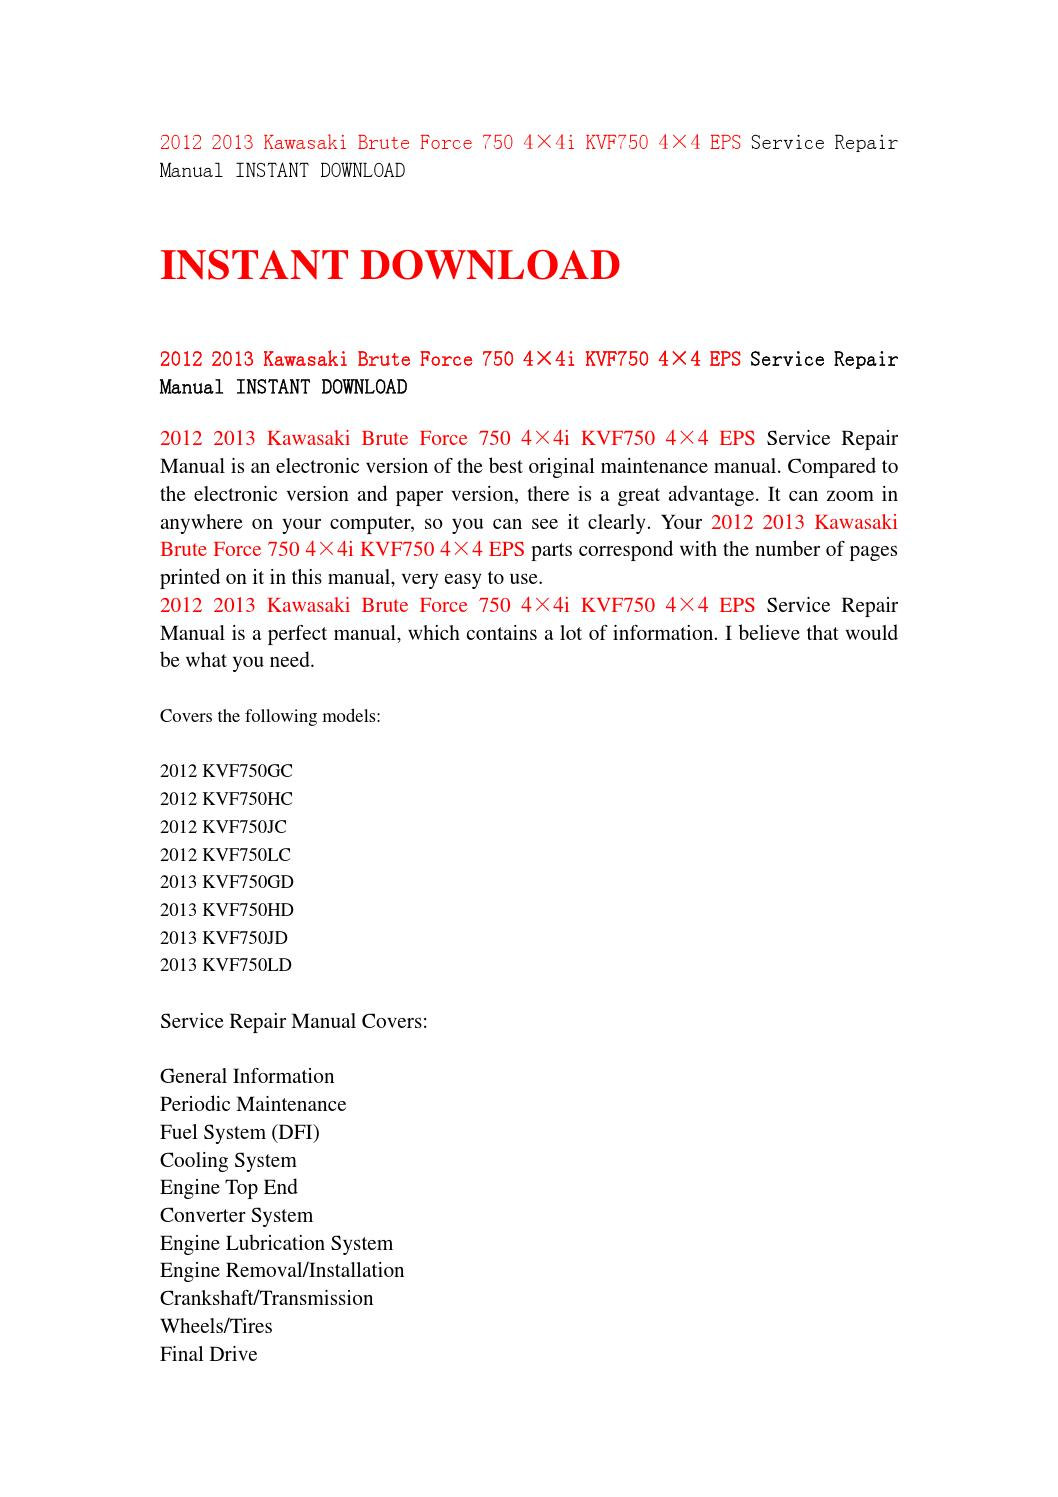 2012 2013 kawasaki brute force 750 4×4i kvf750 4×4 eps service repair manual  instant download by jhsefnhsen76 - issuu